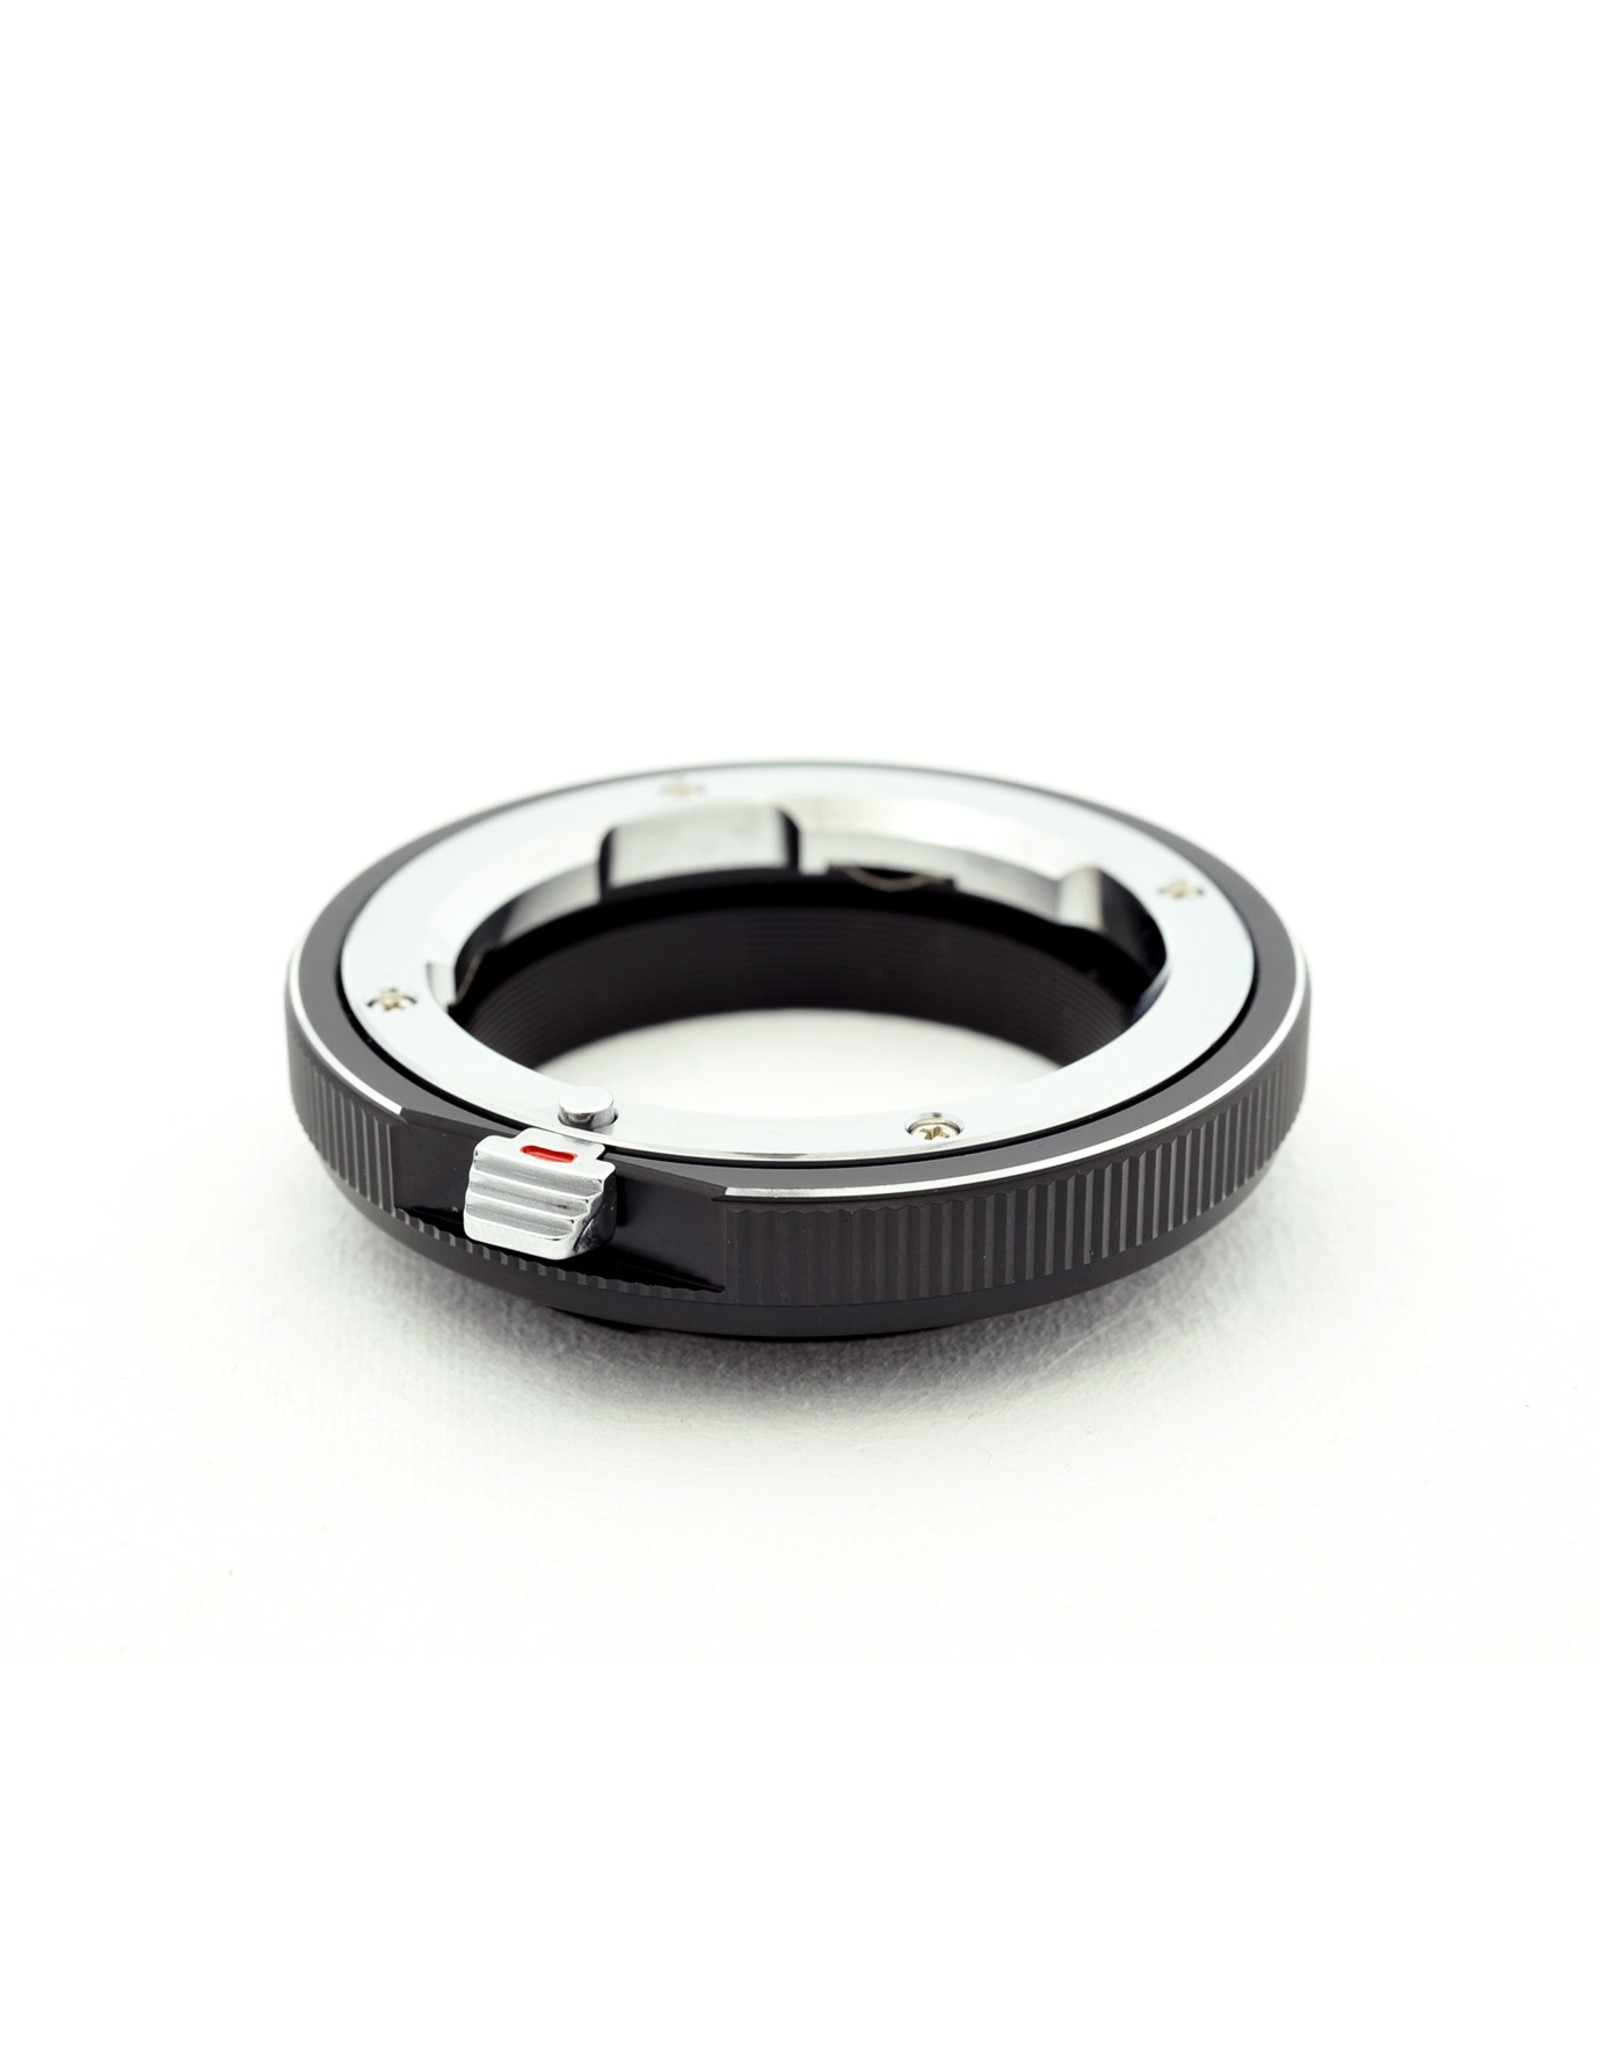 K&F Concept K&F Concept Leica M to NEX Mount Adapter   AP2121910